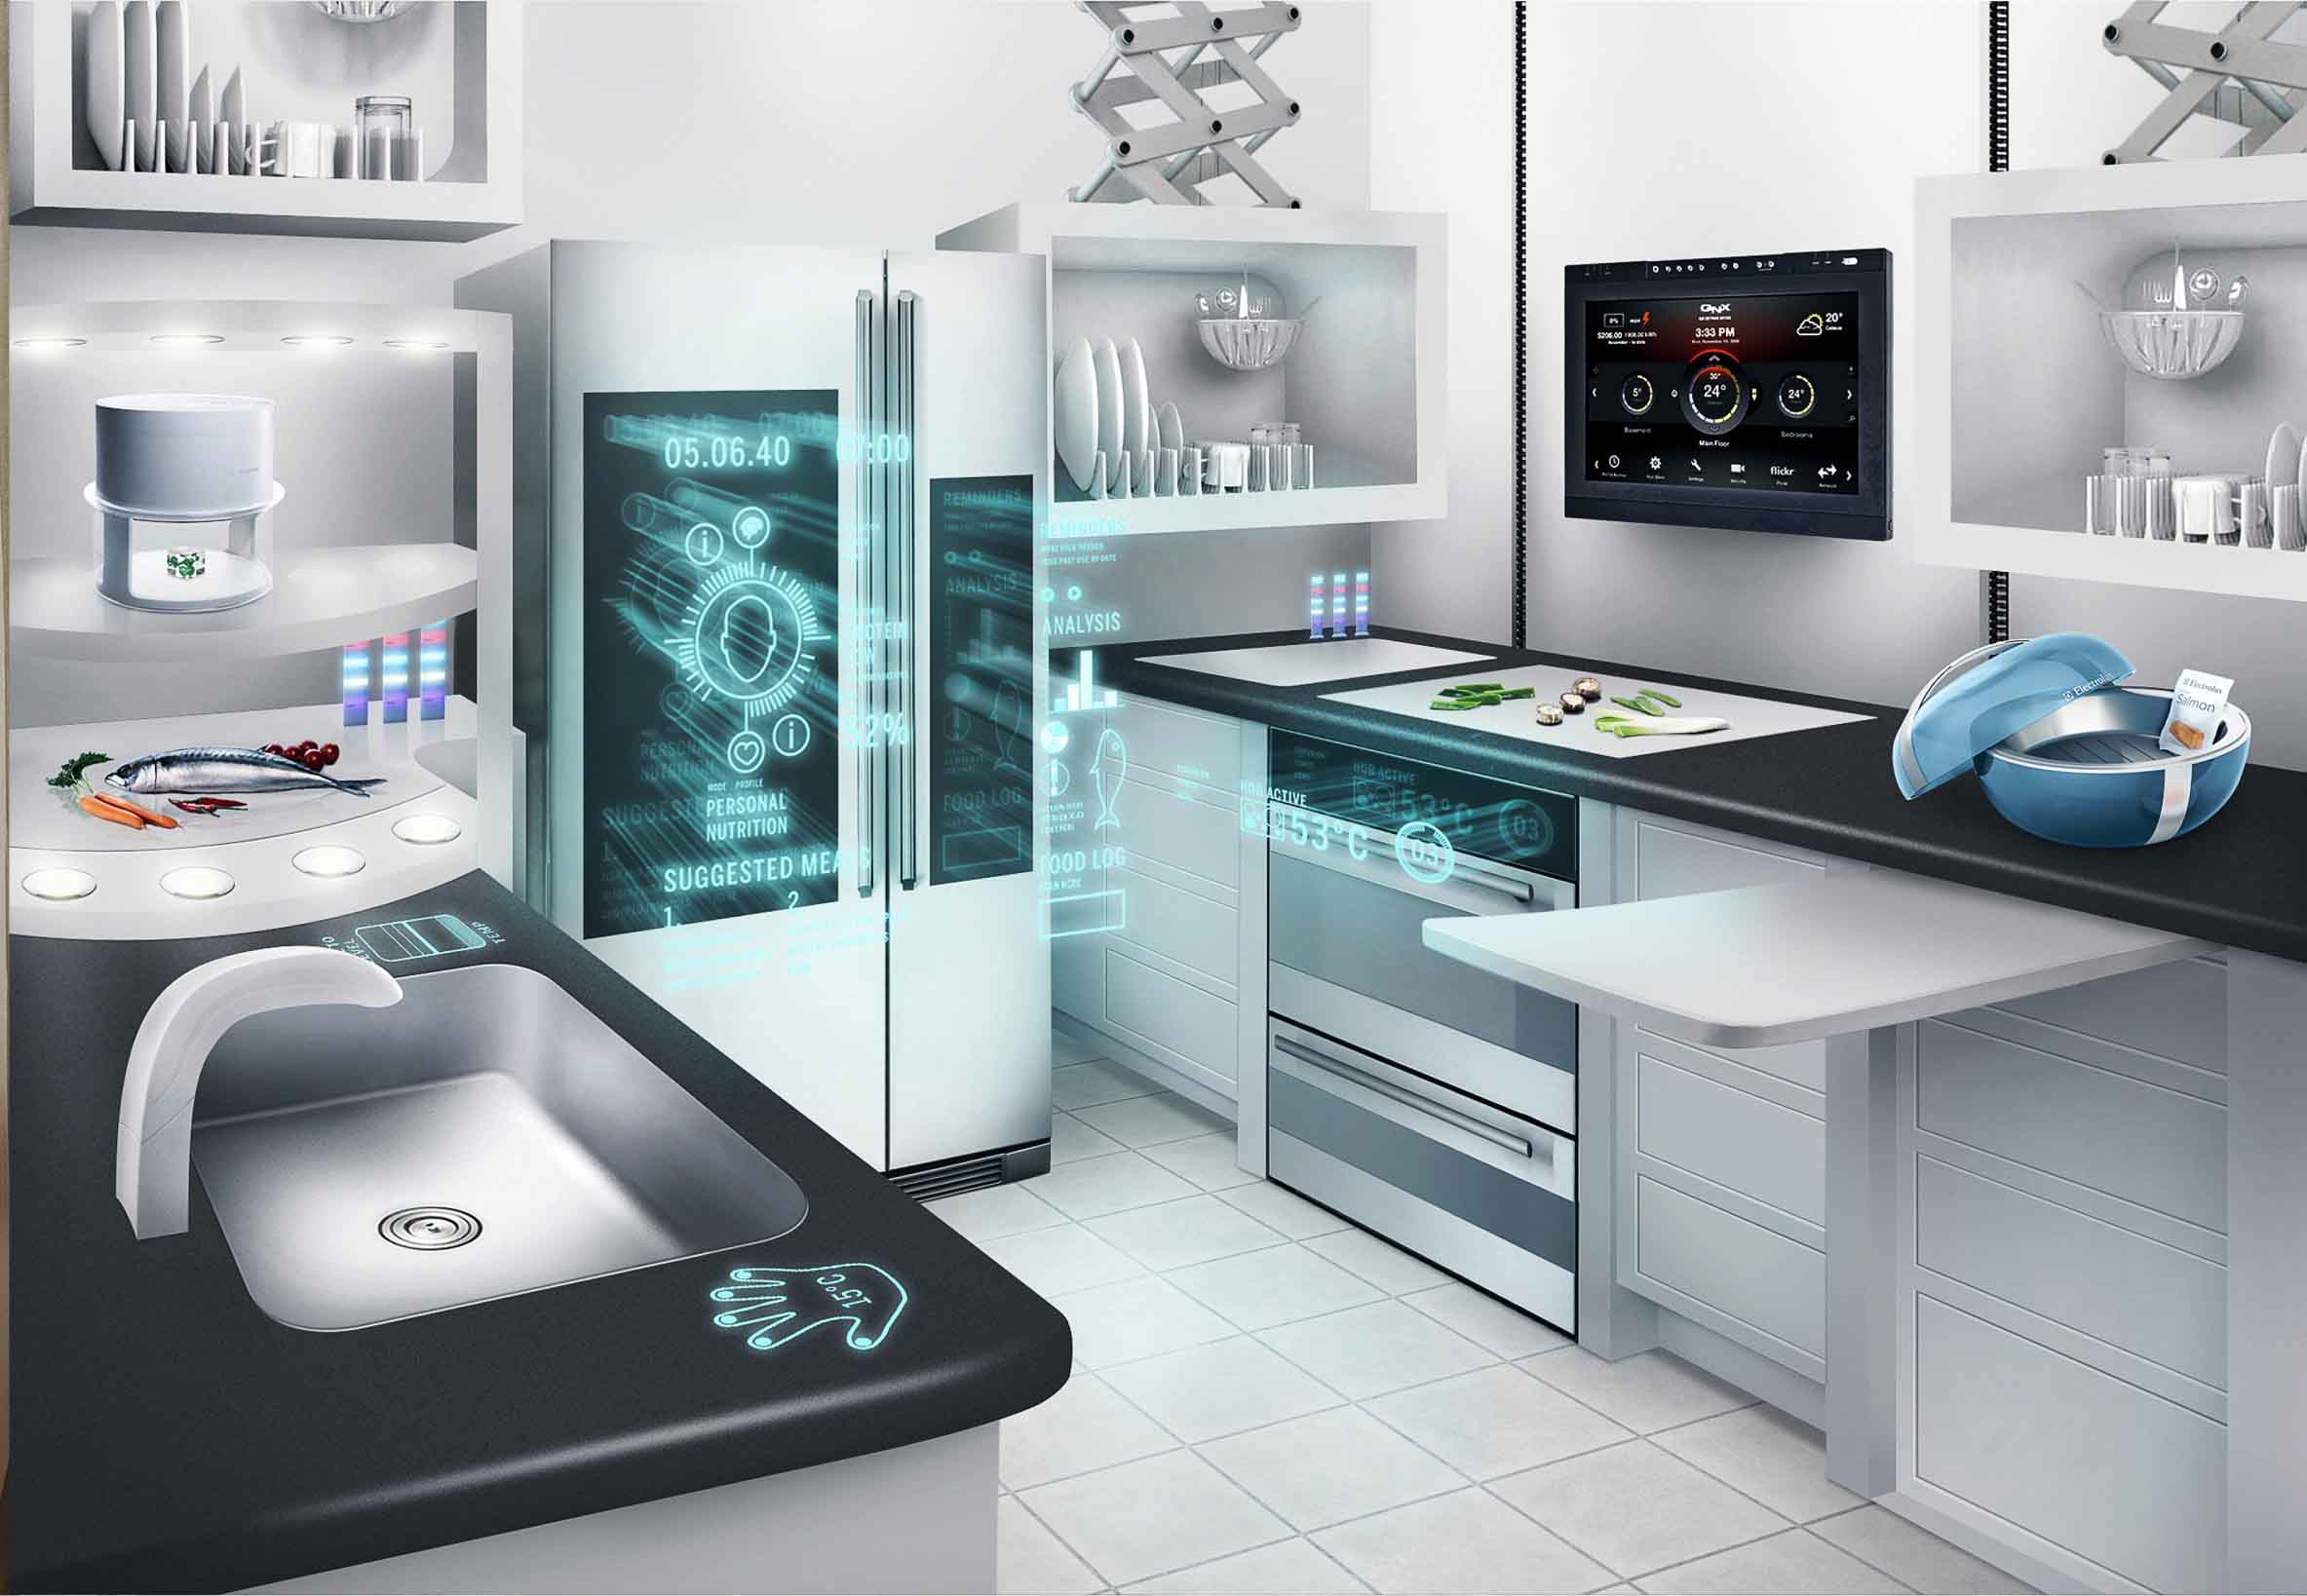 Future kitchen.jpg